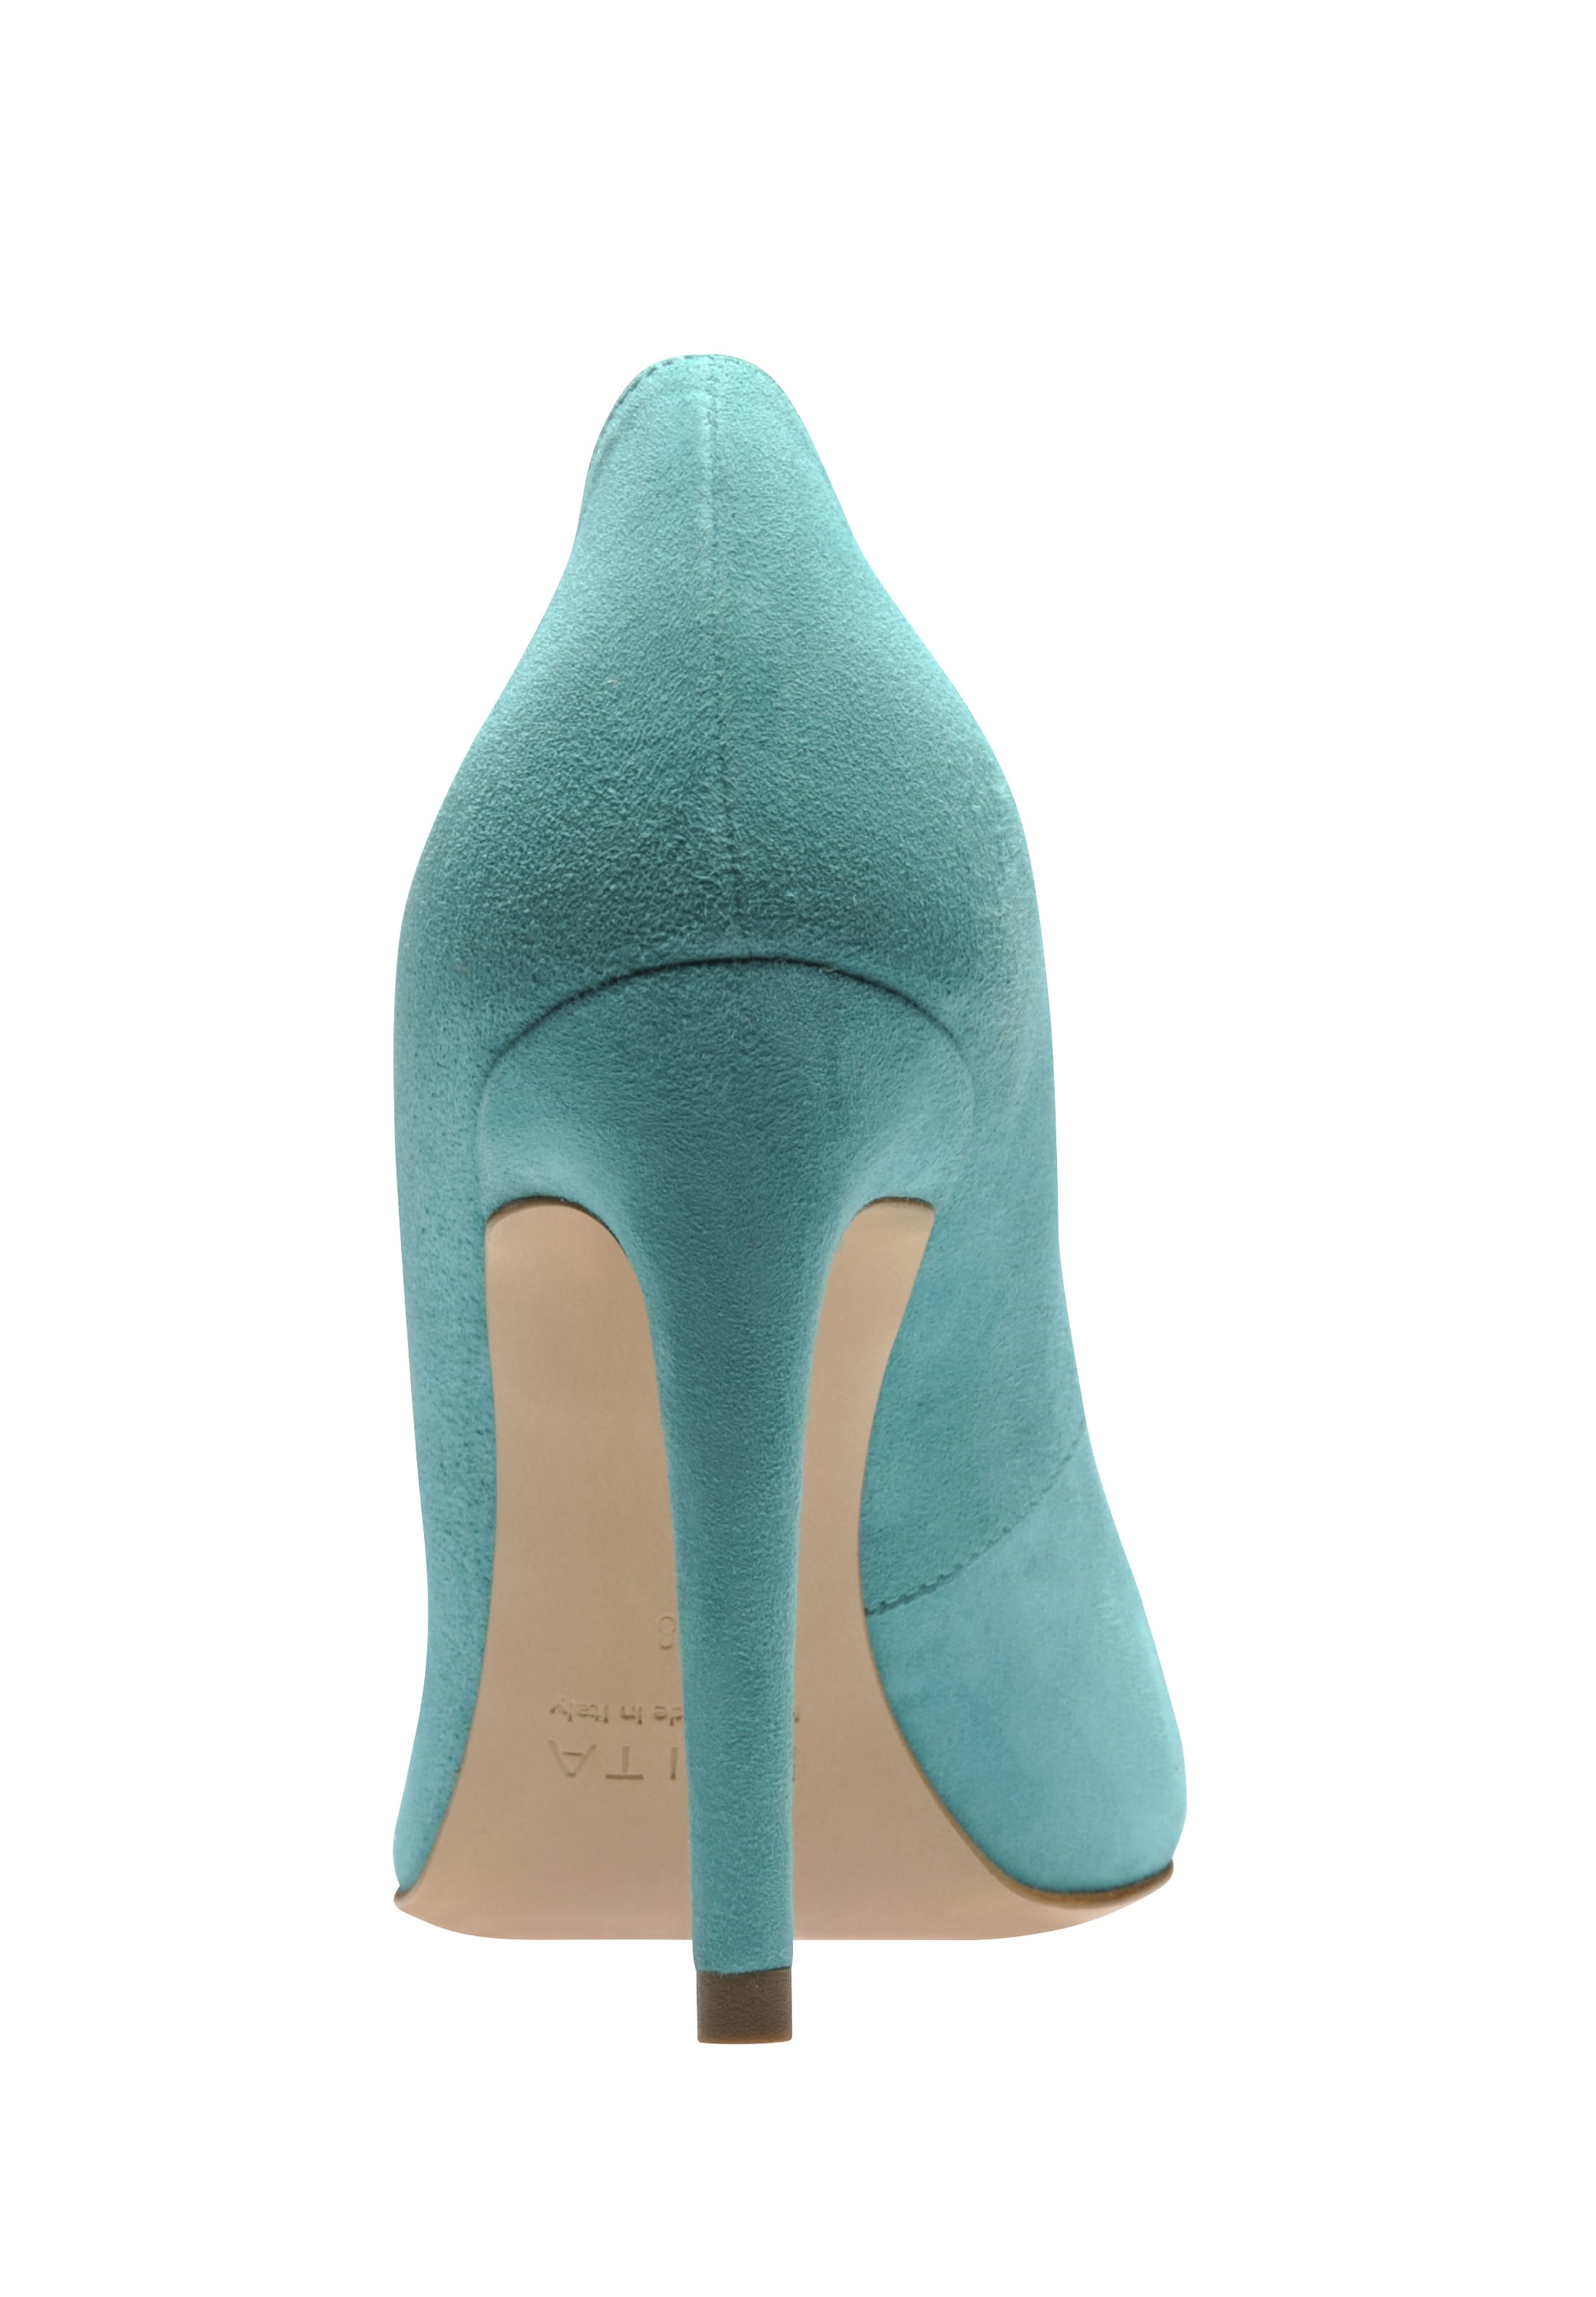 In Pumps Pumps Evita Pumps In Pumps Turquoise In Turquoise Evita Evita Turquoise Evita 8k0nOPwX